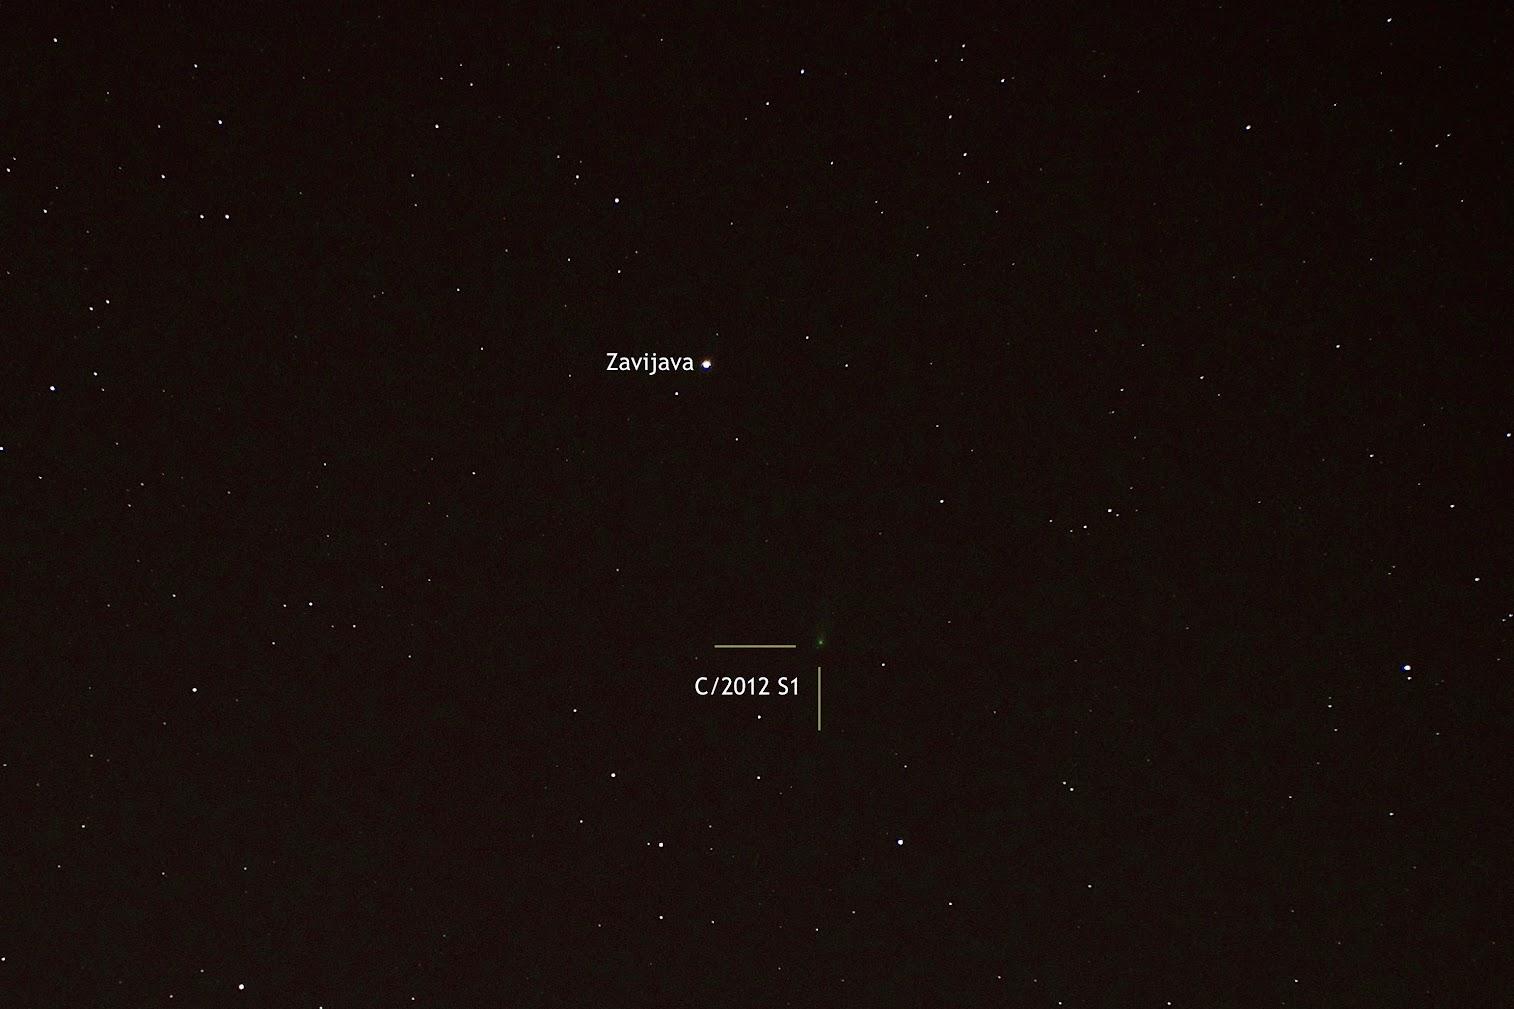 Comet ISON (C/2012 S1) on November 8, 2013